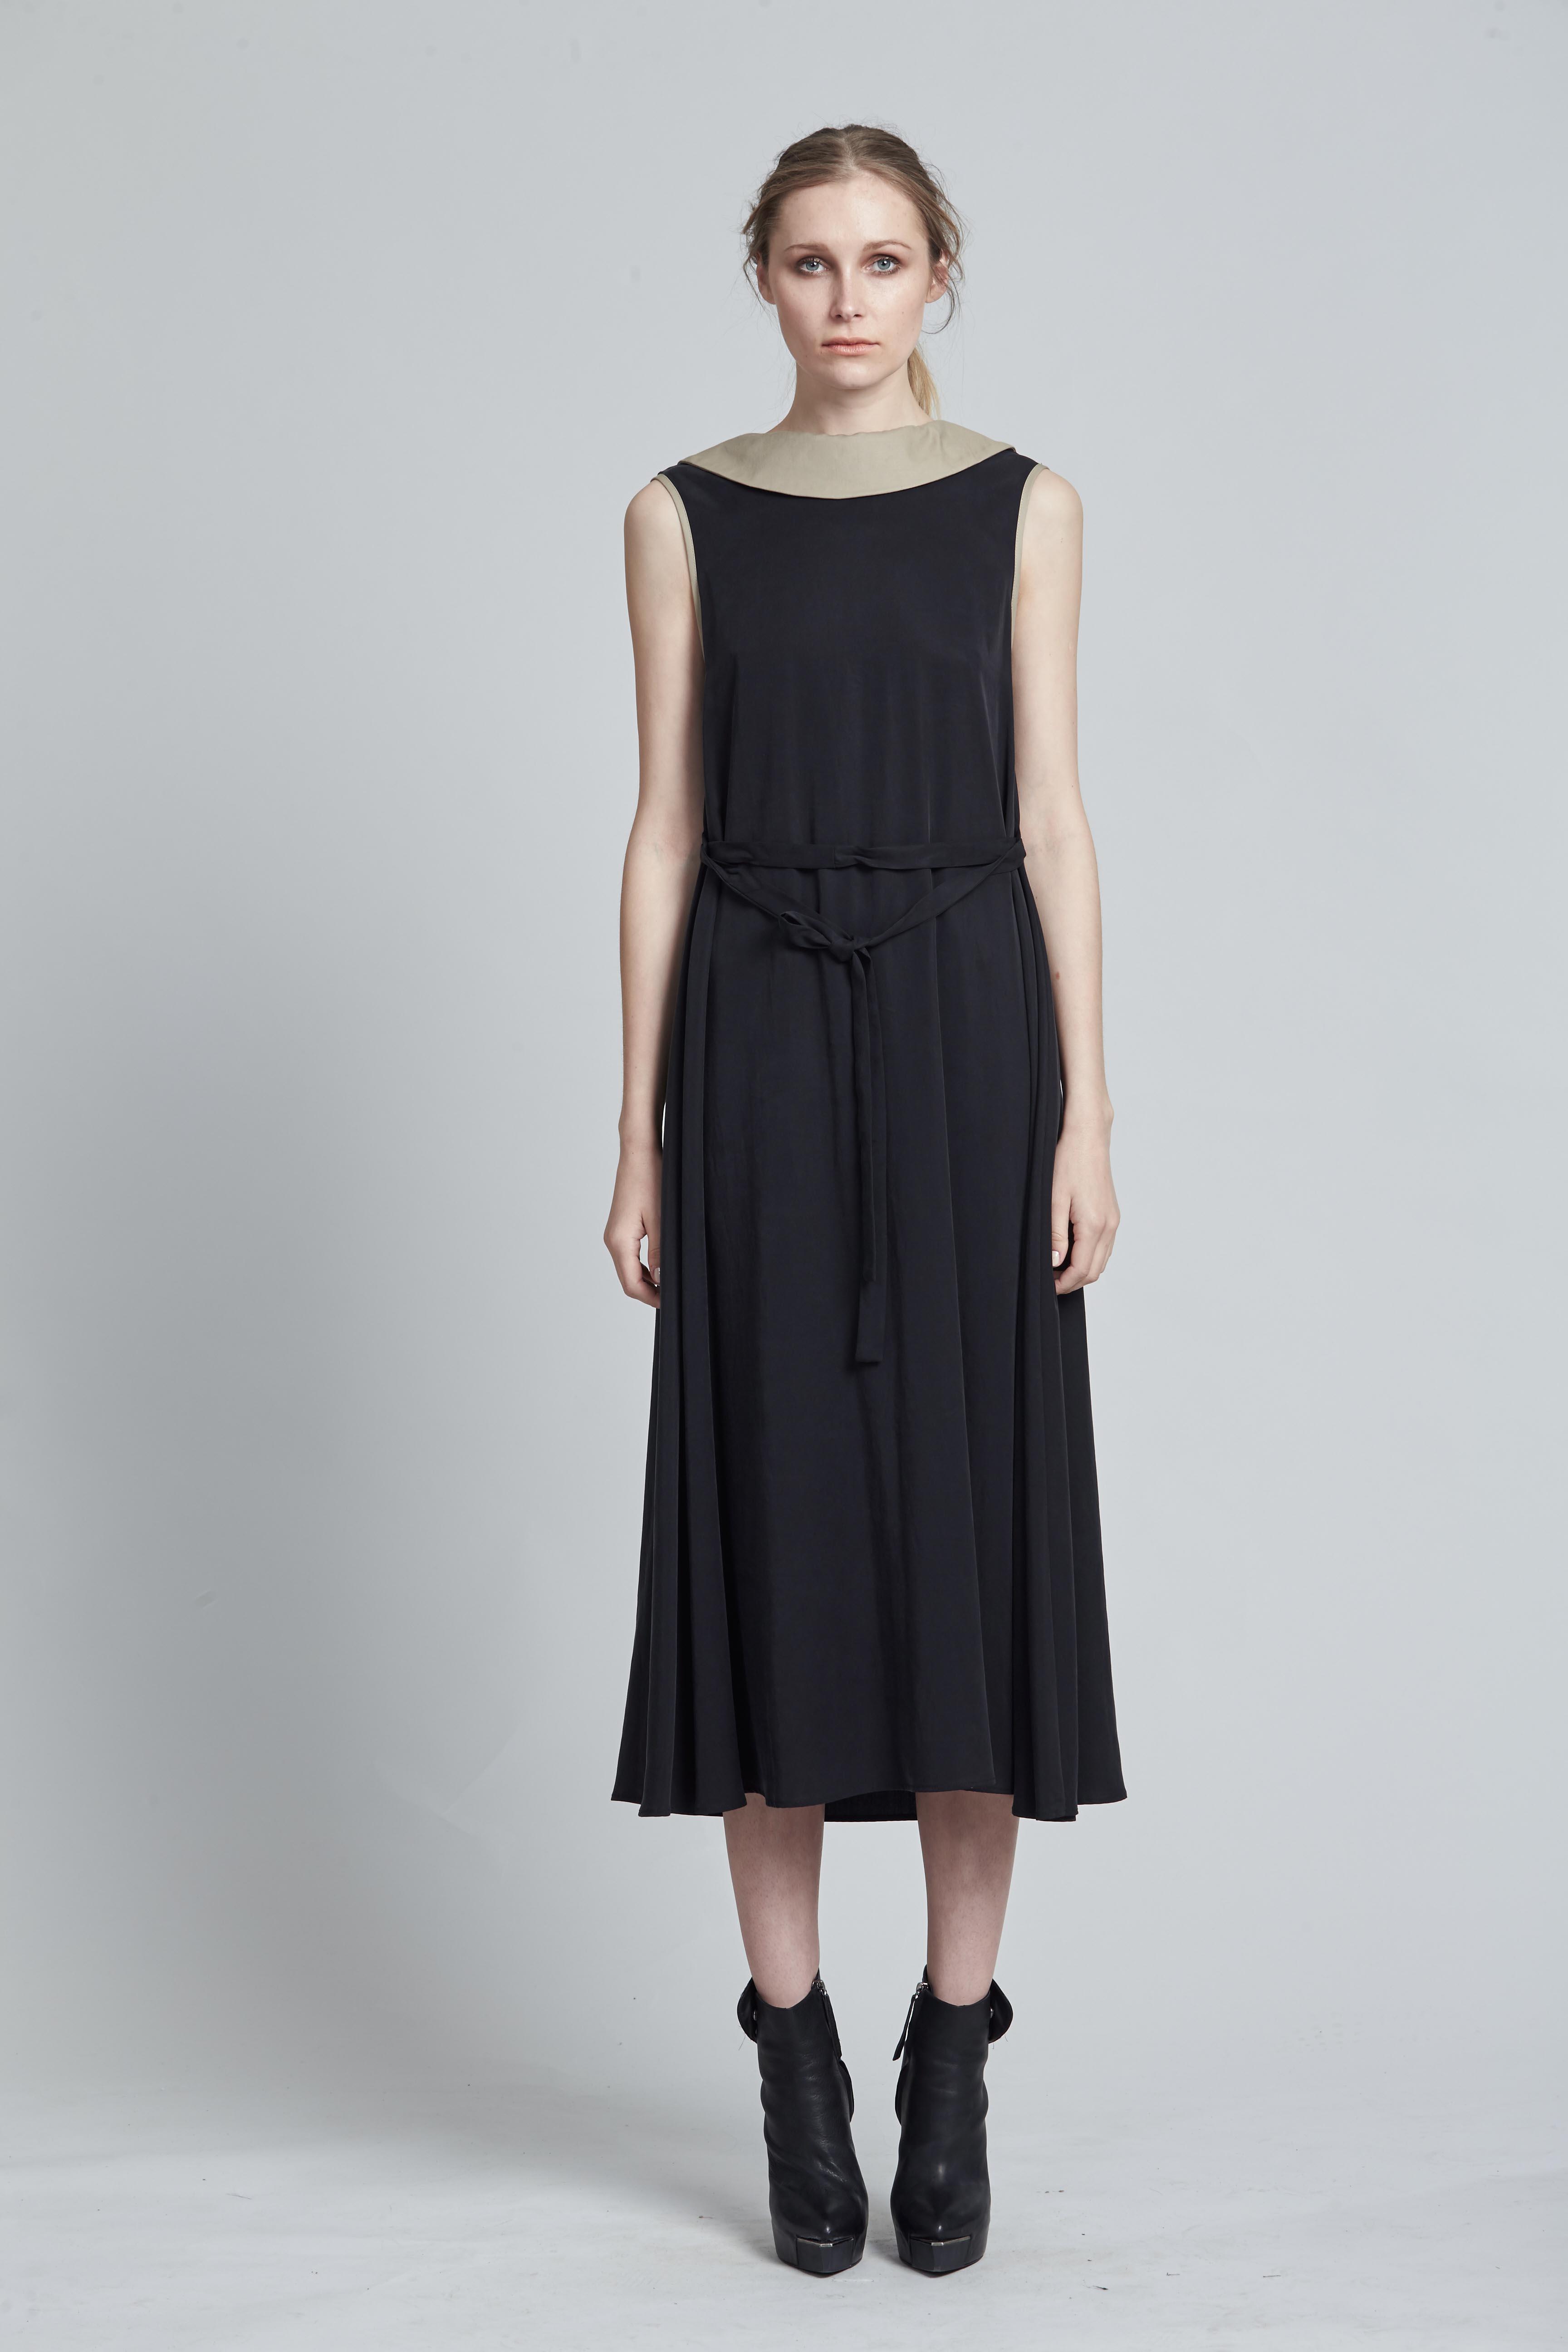 Acute Dress Black 12 taylorS15-1259